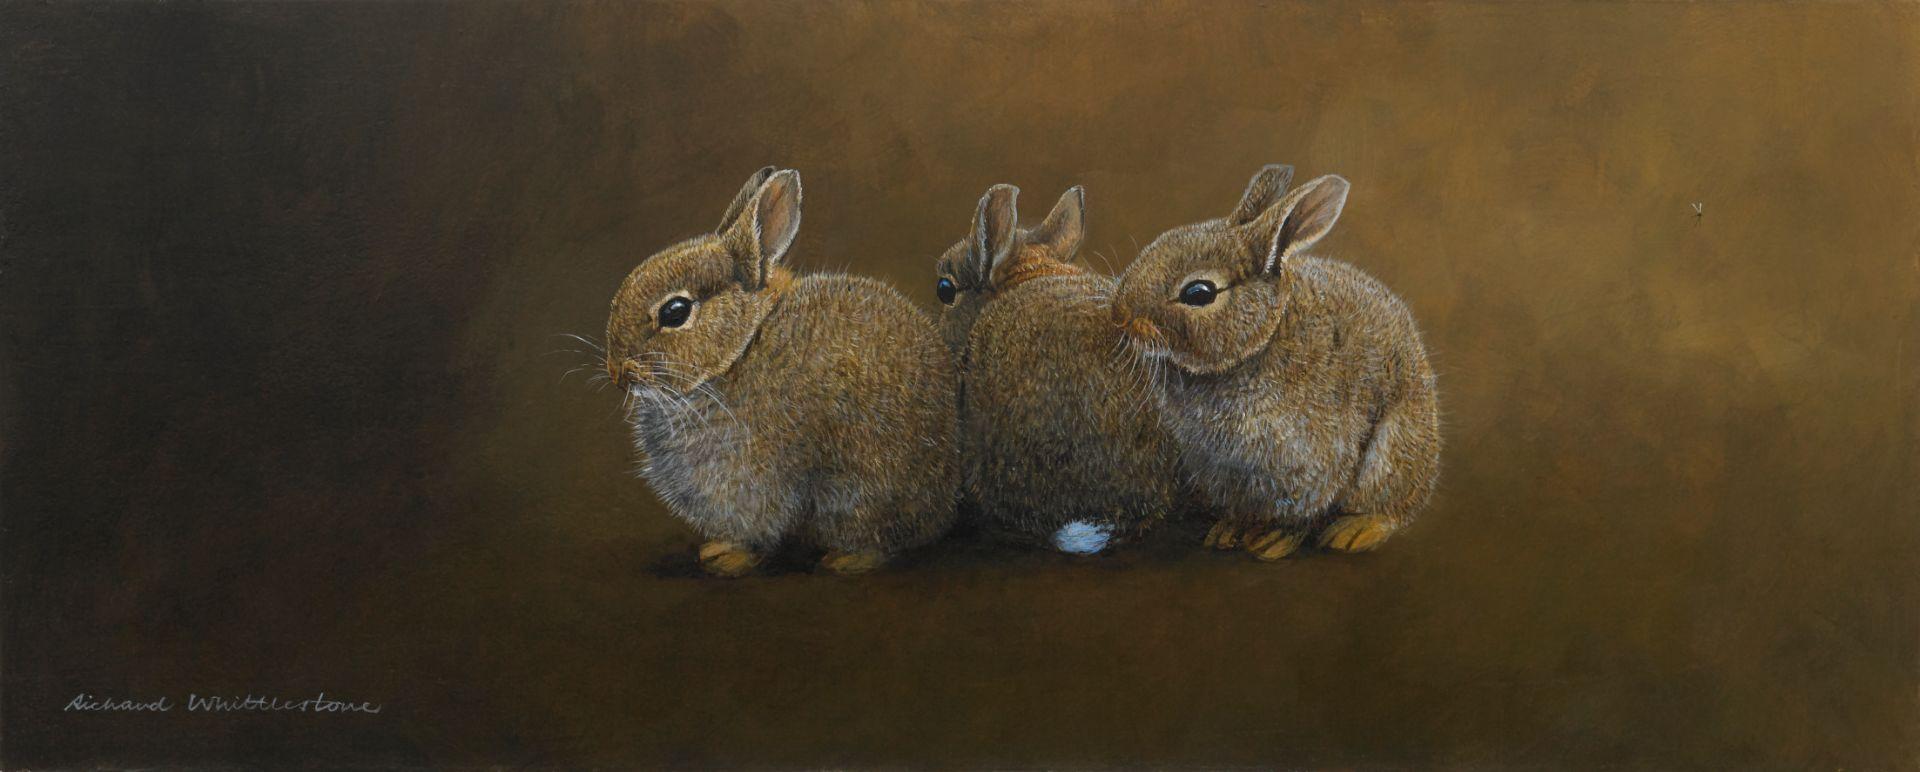 Richard-Whittlestone-Prints-Rabbit-Row